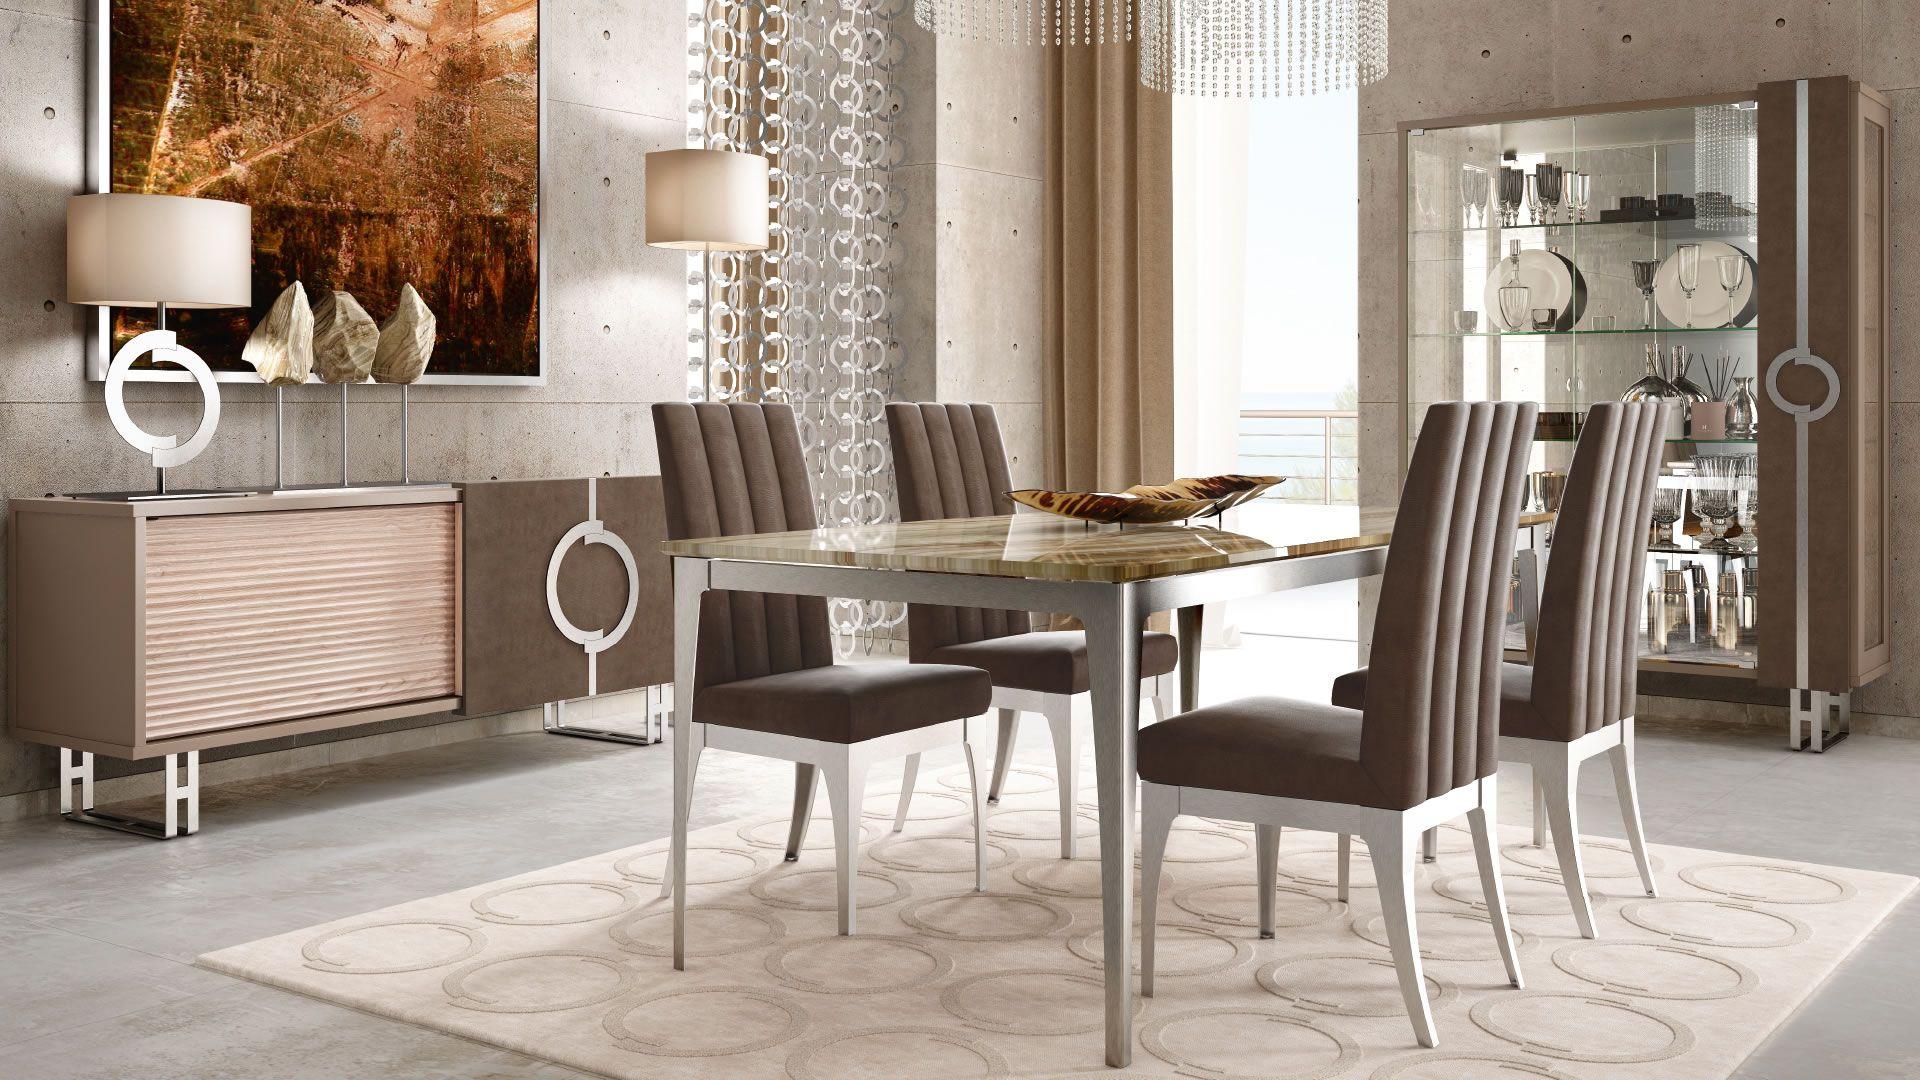 Sala Da Pranzo Contemporanea : Questa sala da pranzo composta da mobili di arredo in stile